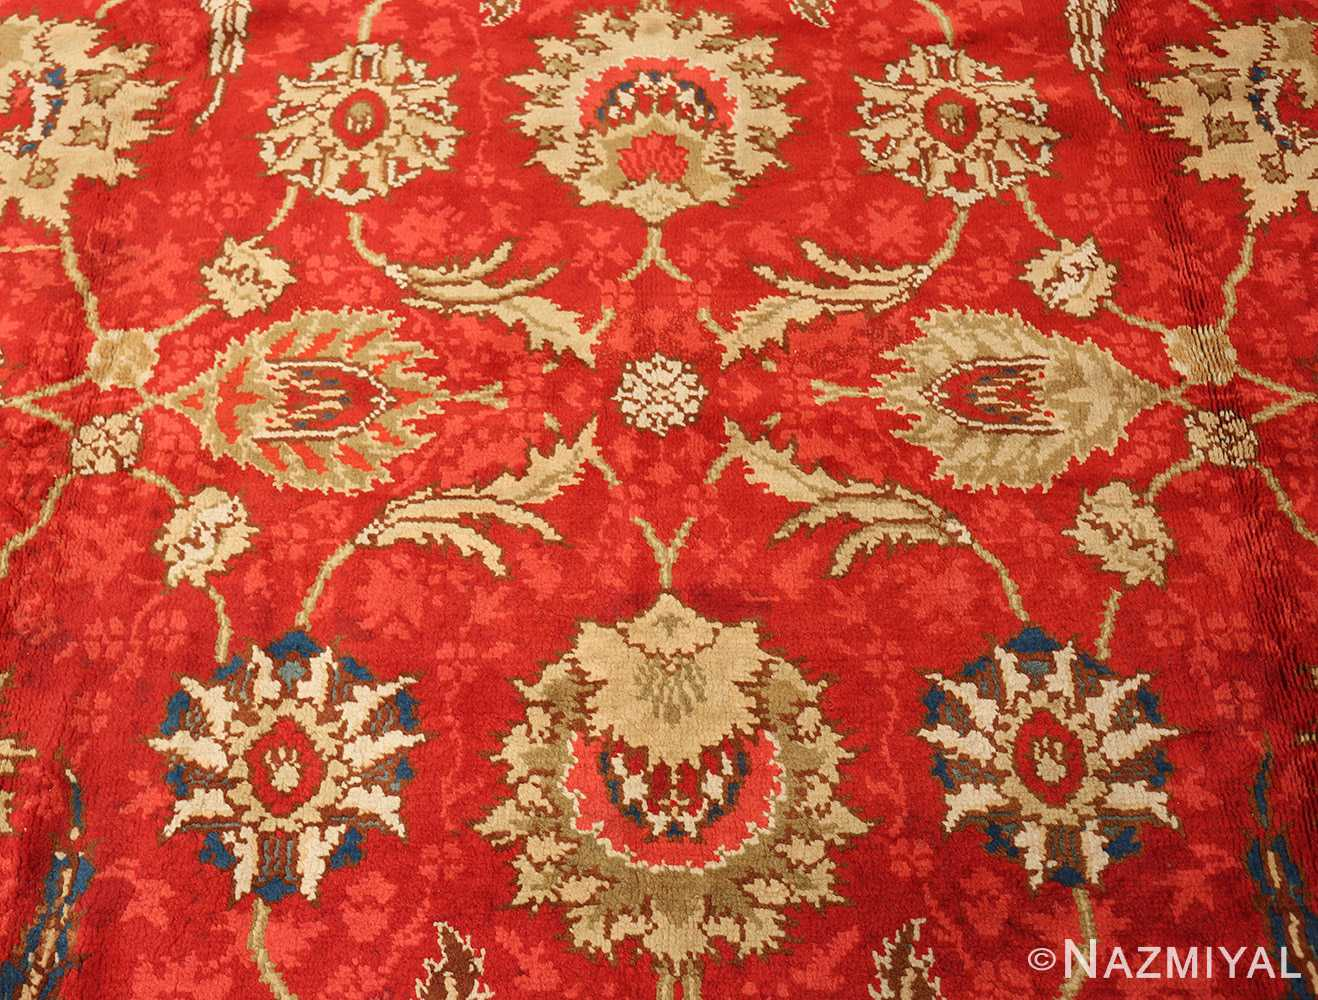 antique arts and crafts donegal irish rug 47137 side Nazmiyal